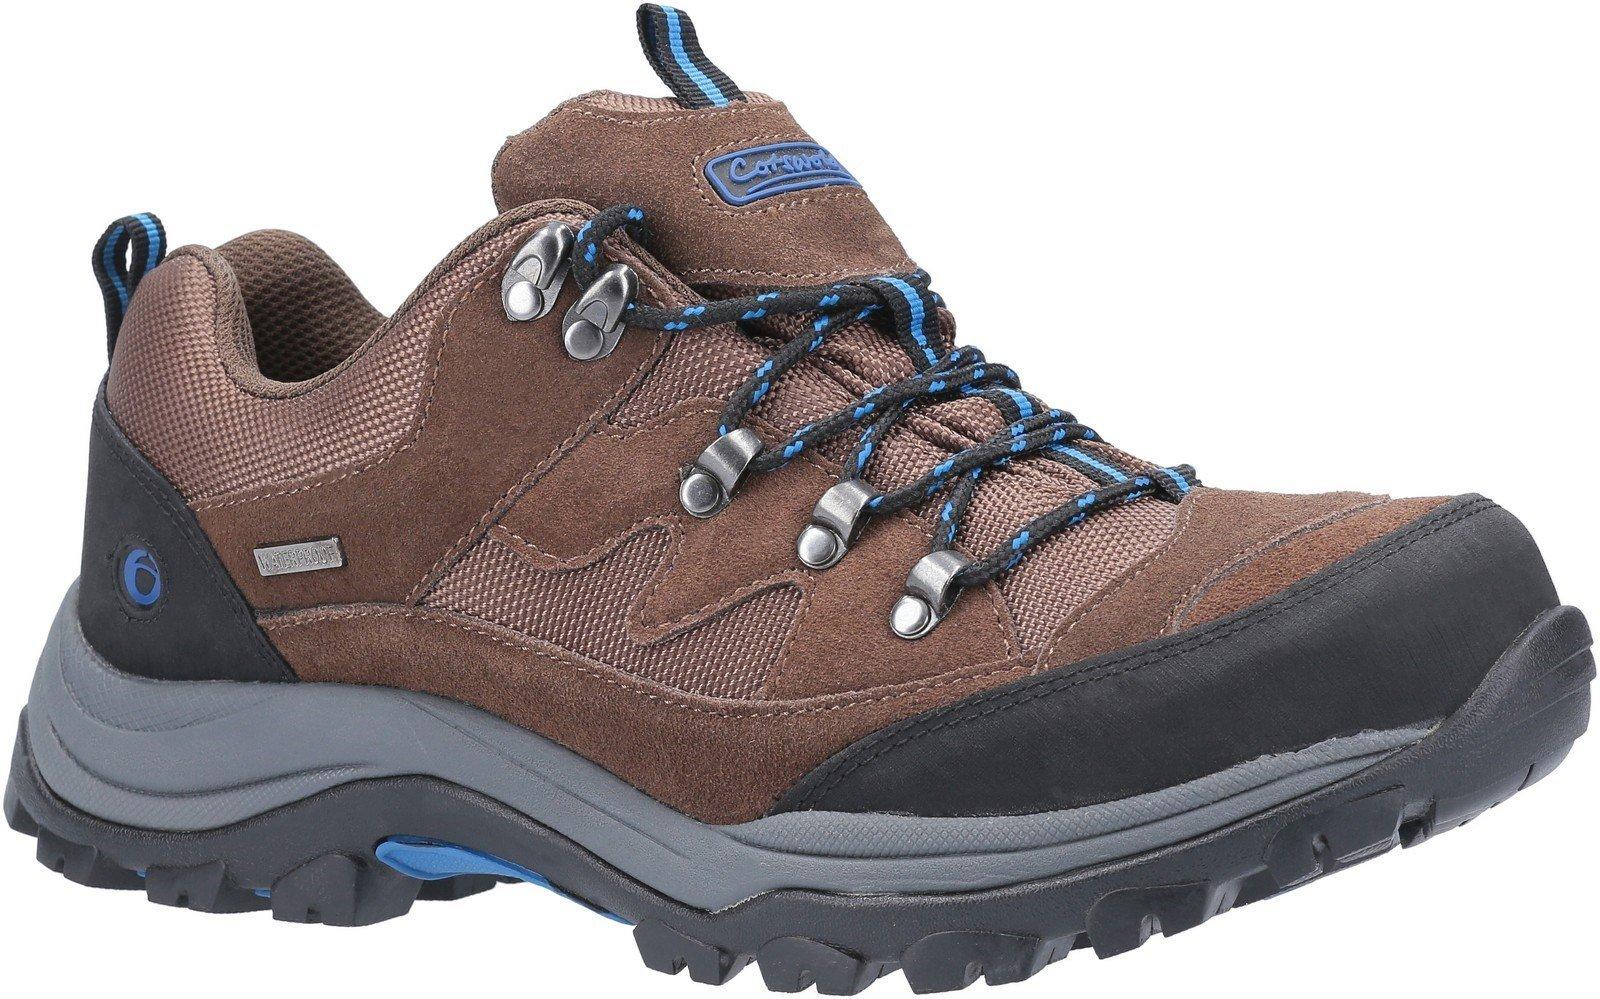 Cotswold Men's Oxerton Low Hiker Shoe Brown 26278 - Brown/Blue 7